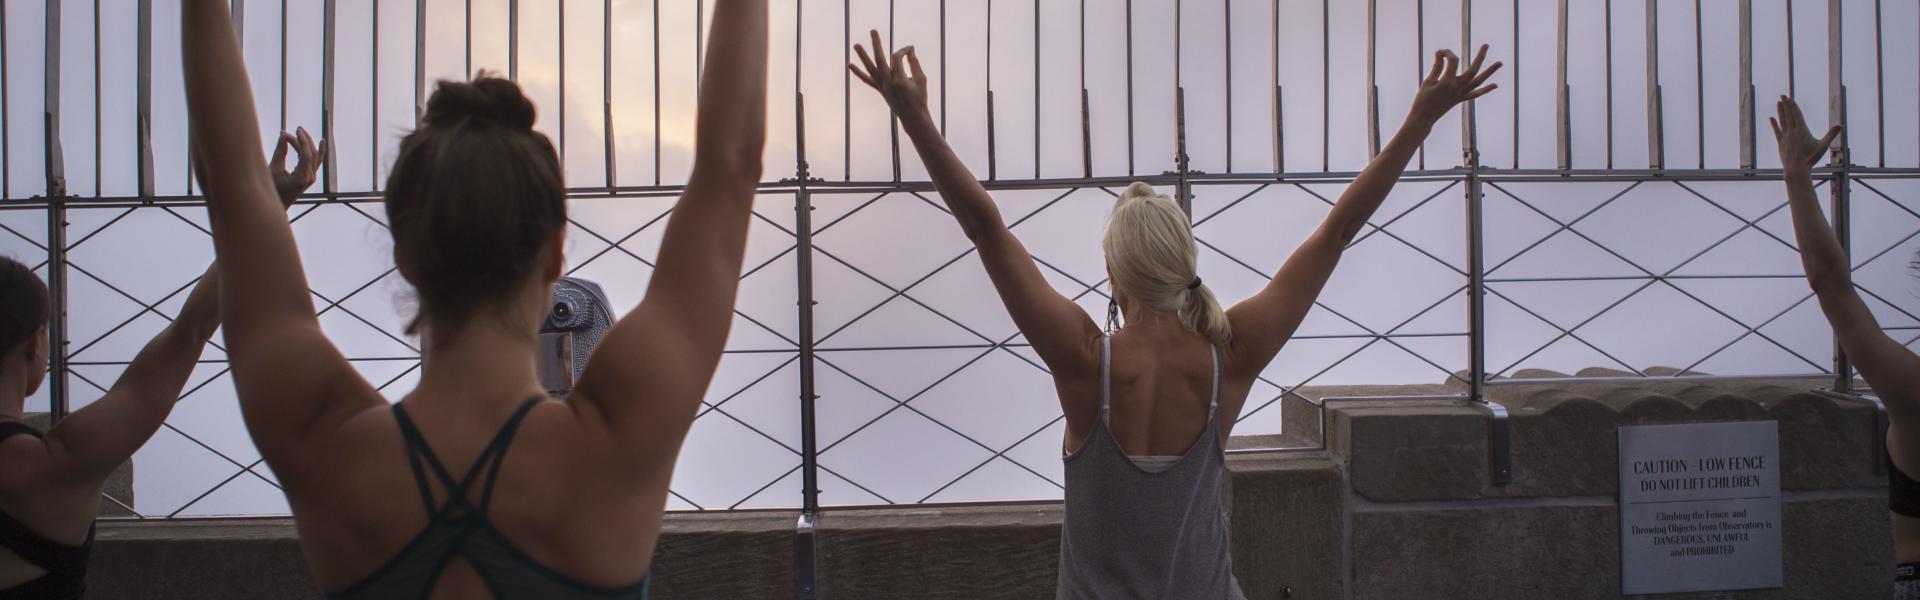 Empire State Building, Sunrise, Yoga